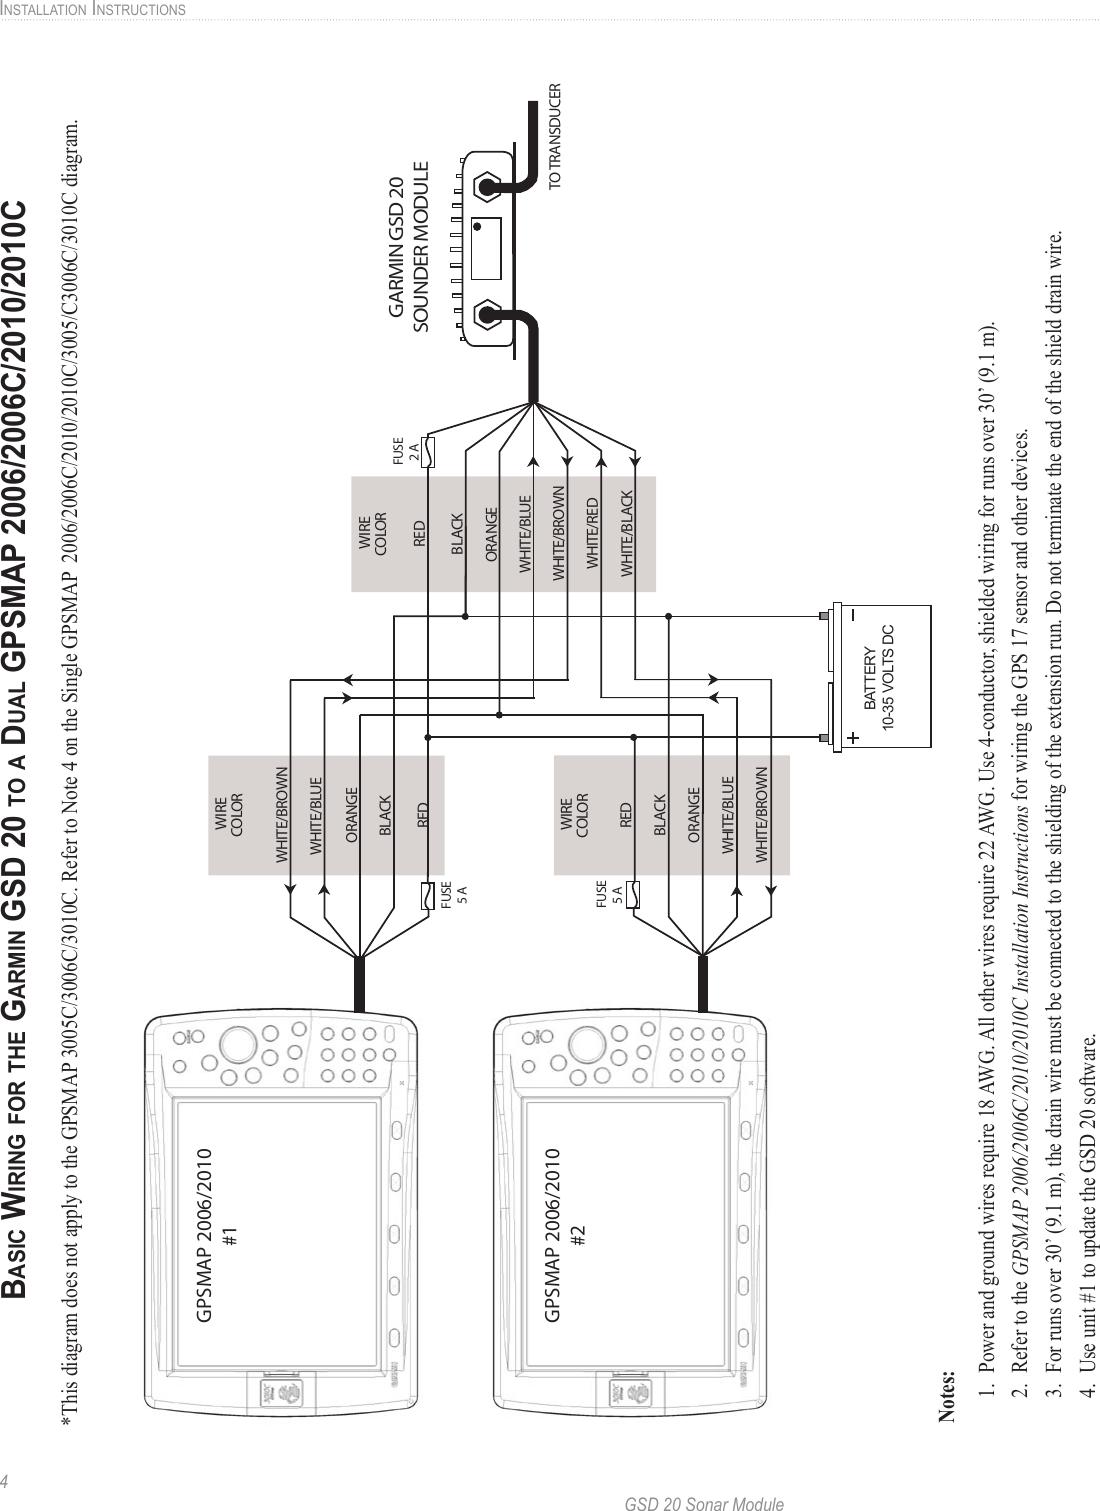 Garmin 536 M Gsd 20 Manual Installation Guide 190 00255 00 0e